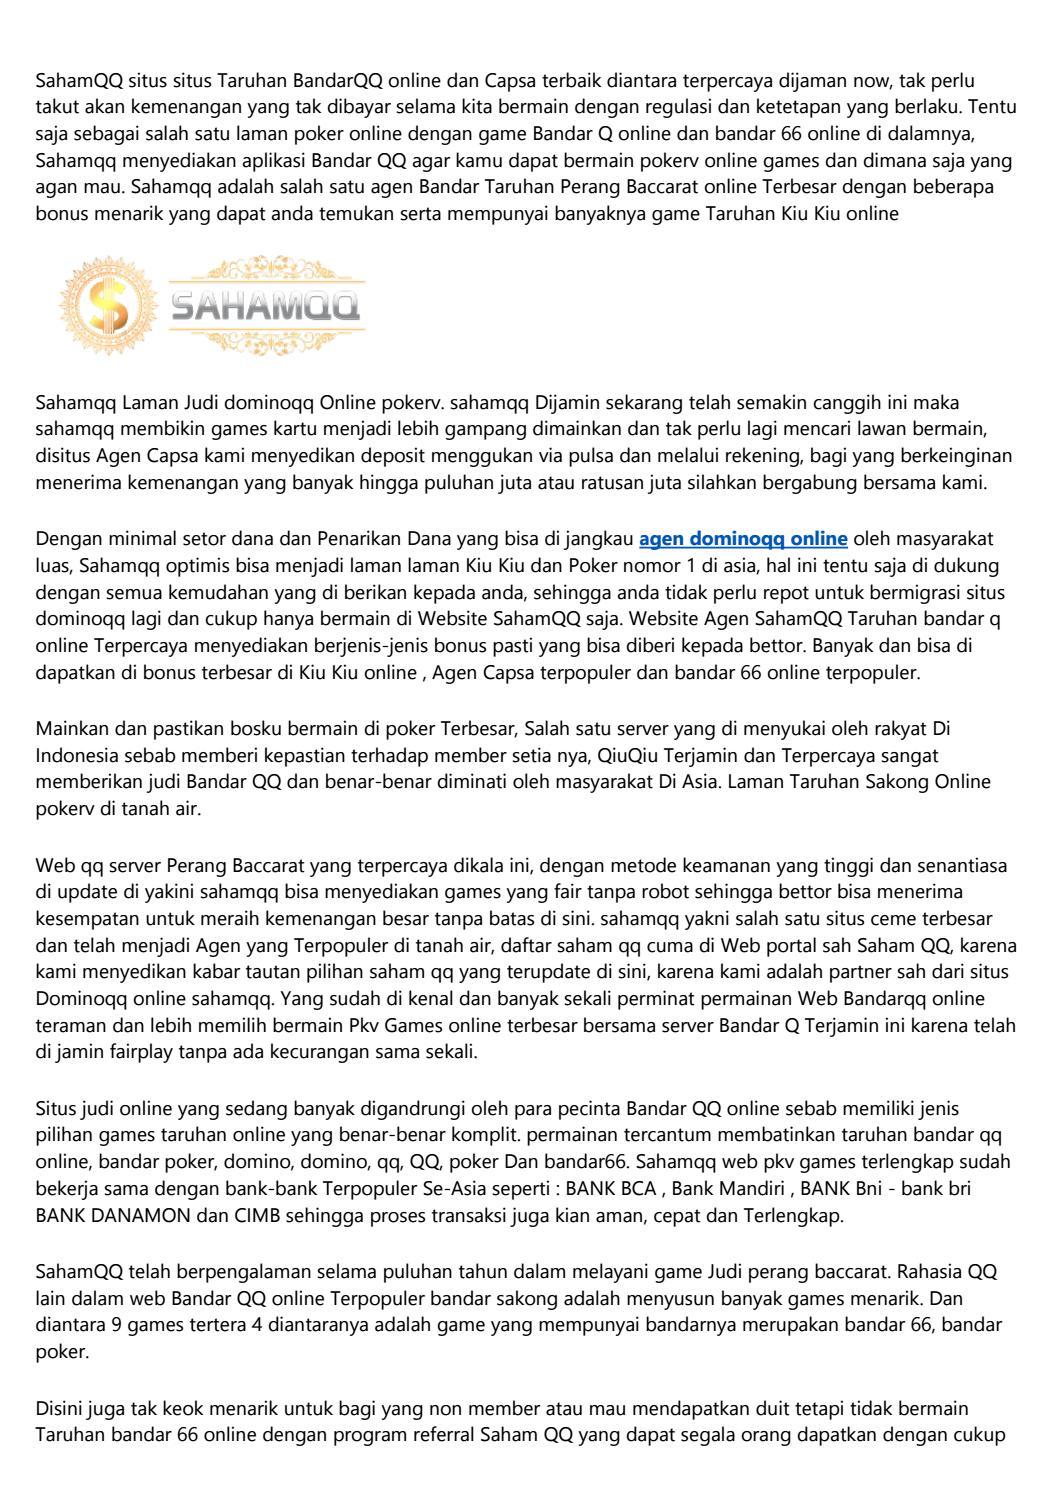 Agen Judi Bandarqq Online Terpercaya Website Domino Qq Terbaik By H1wgxdz776 Issuu